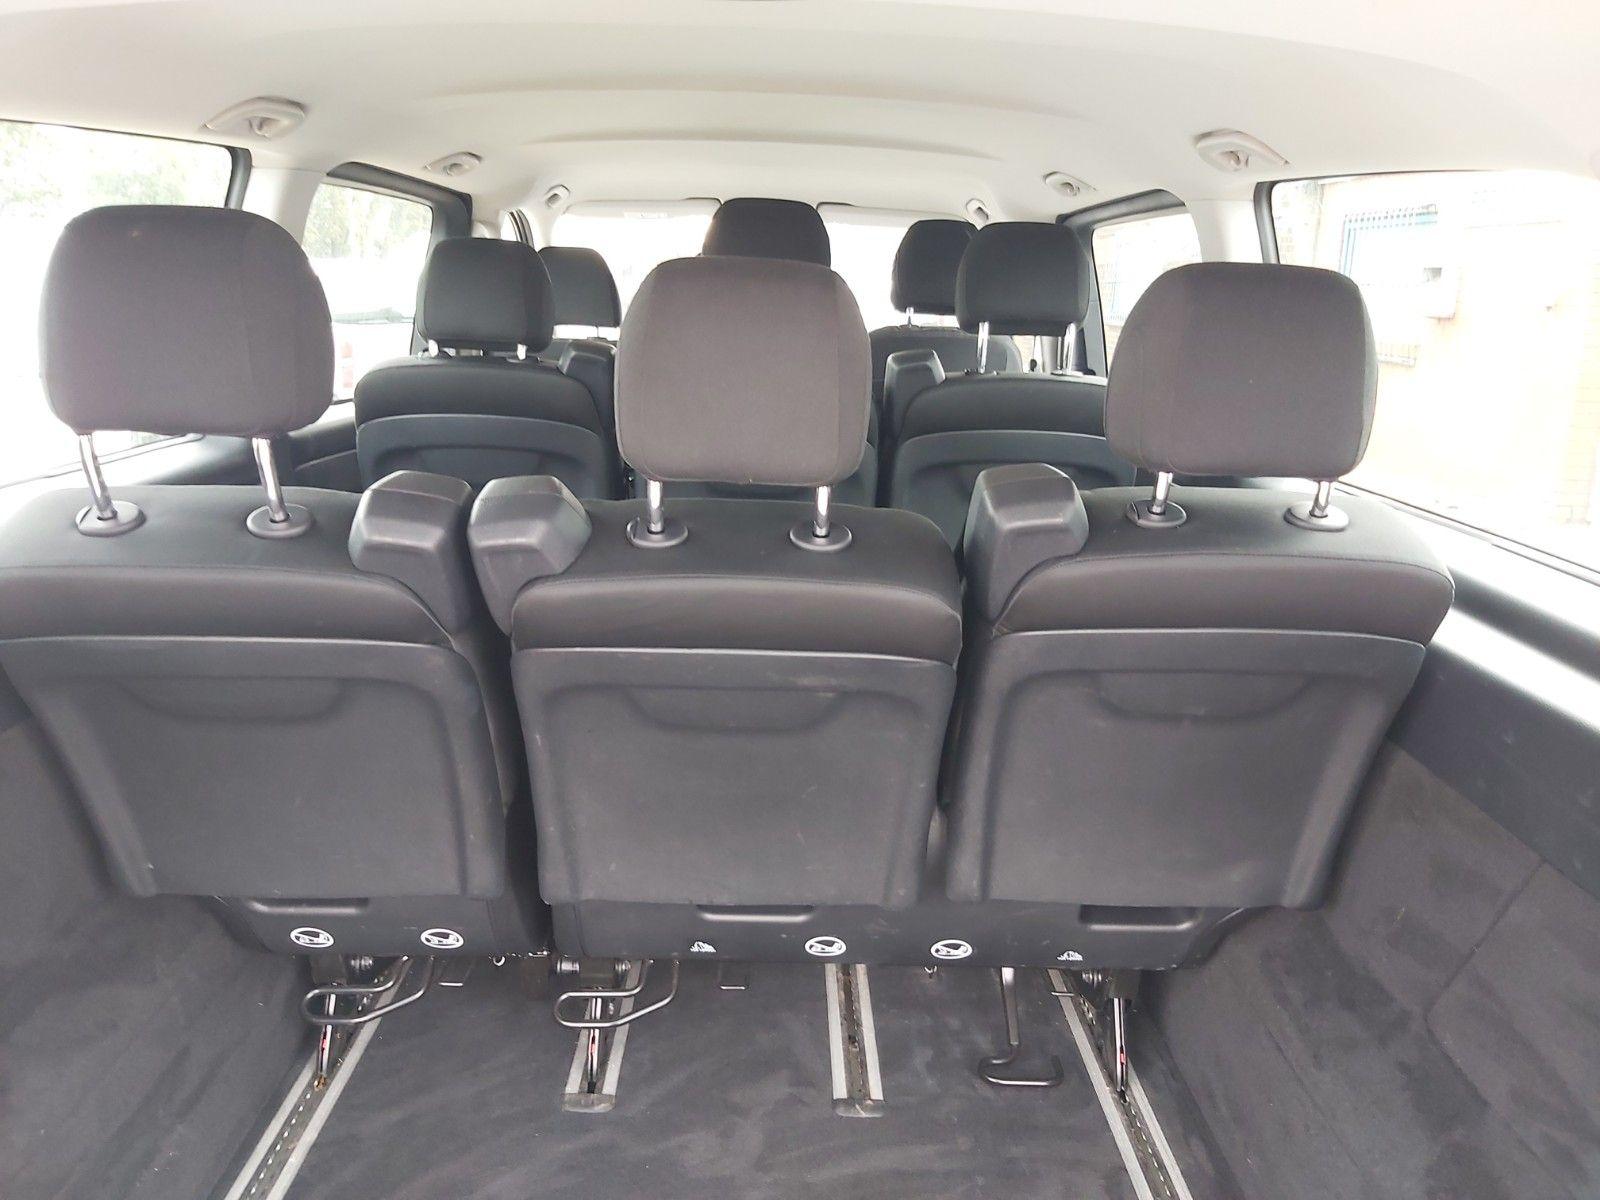 2019 Mercedes-Benz Vito 119 Cdi Select 8-Seater 7G-Tronic (KX19TVP) Image 13